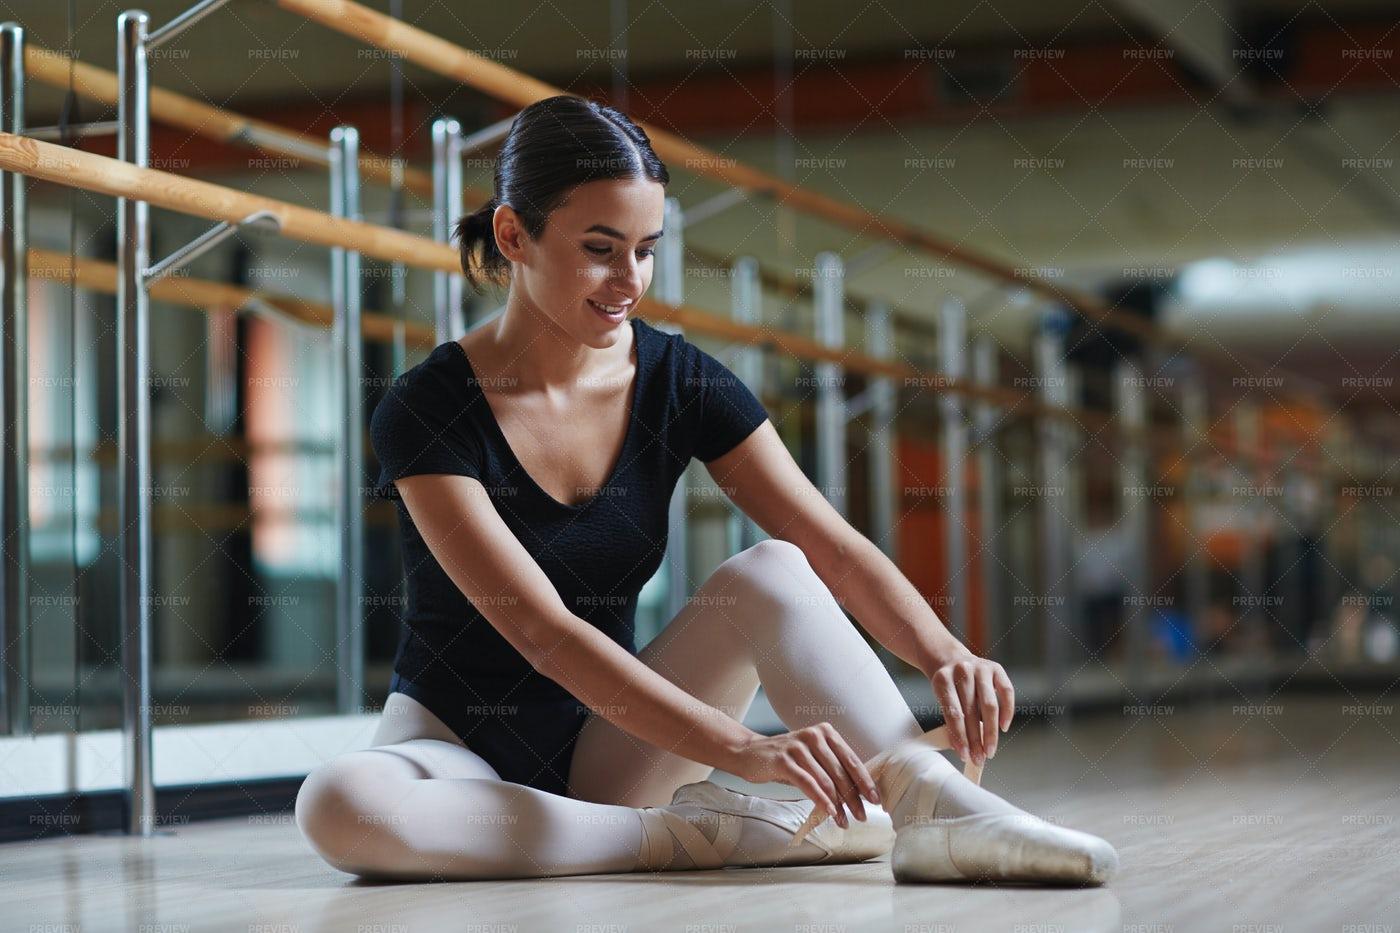 Starting Ballet Lesson: Stock Photos